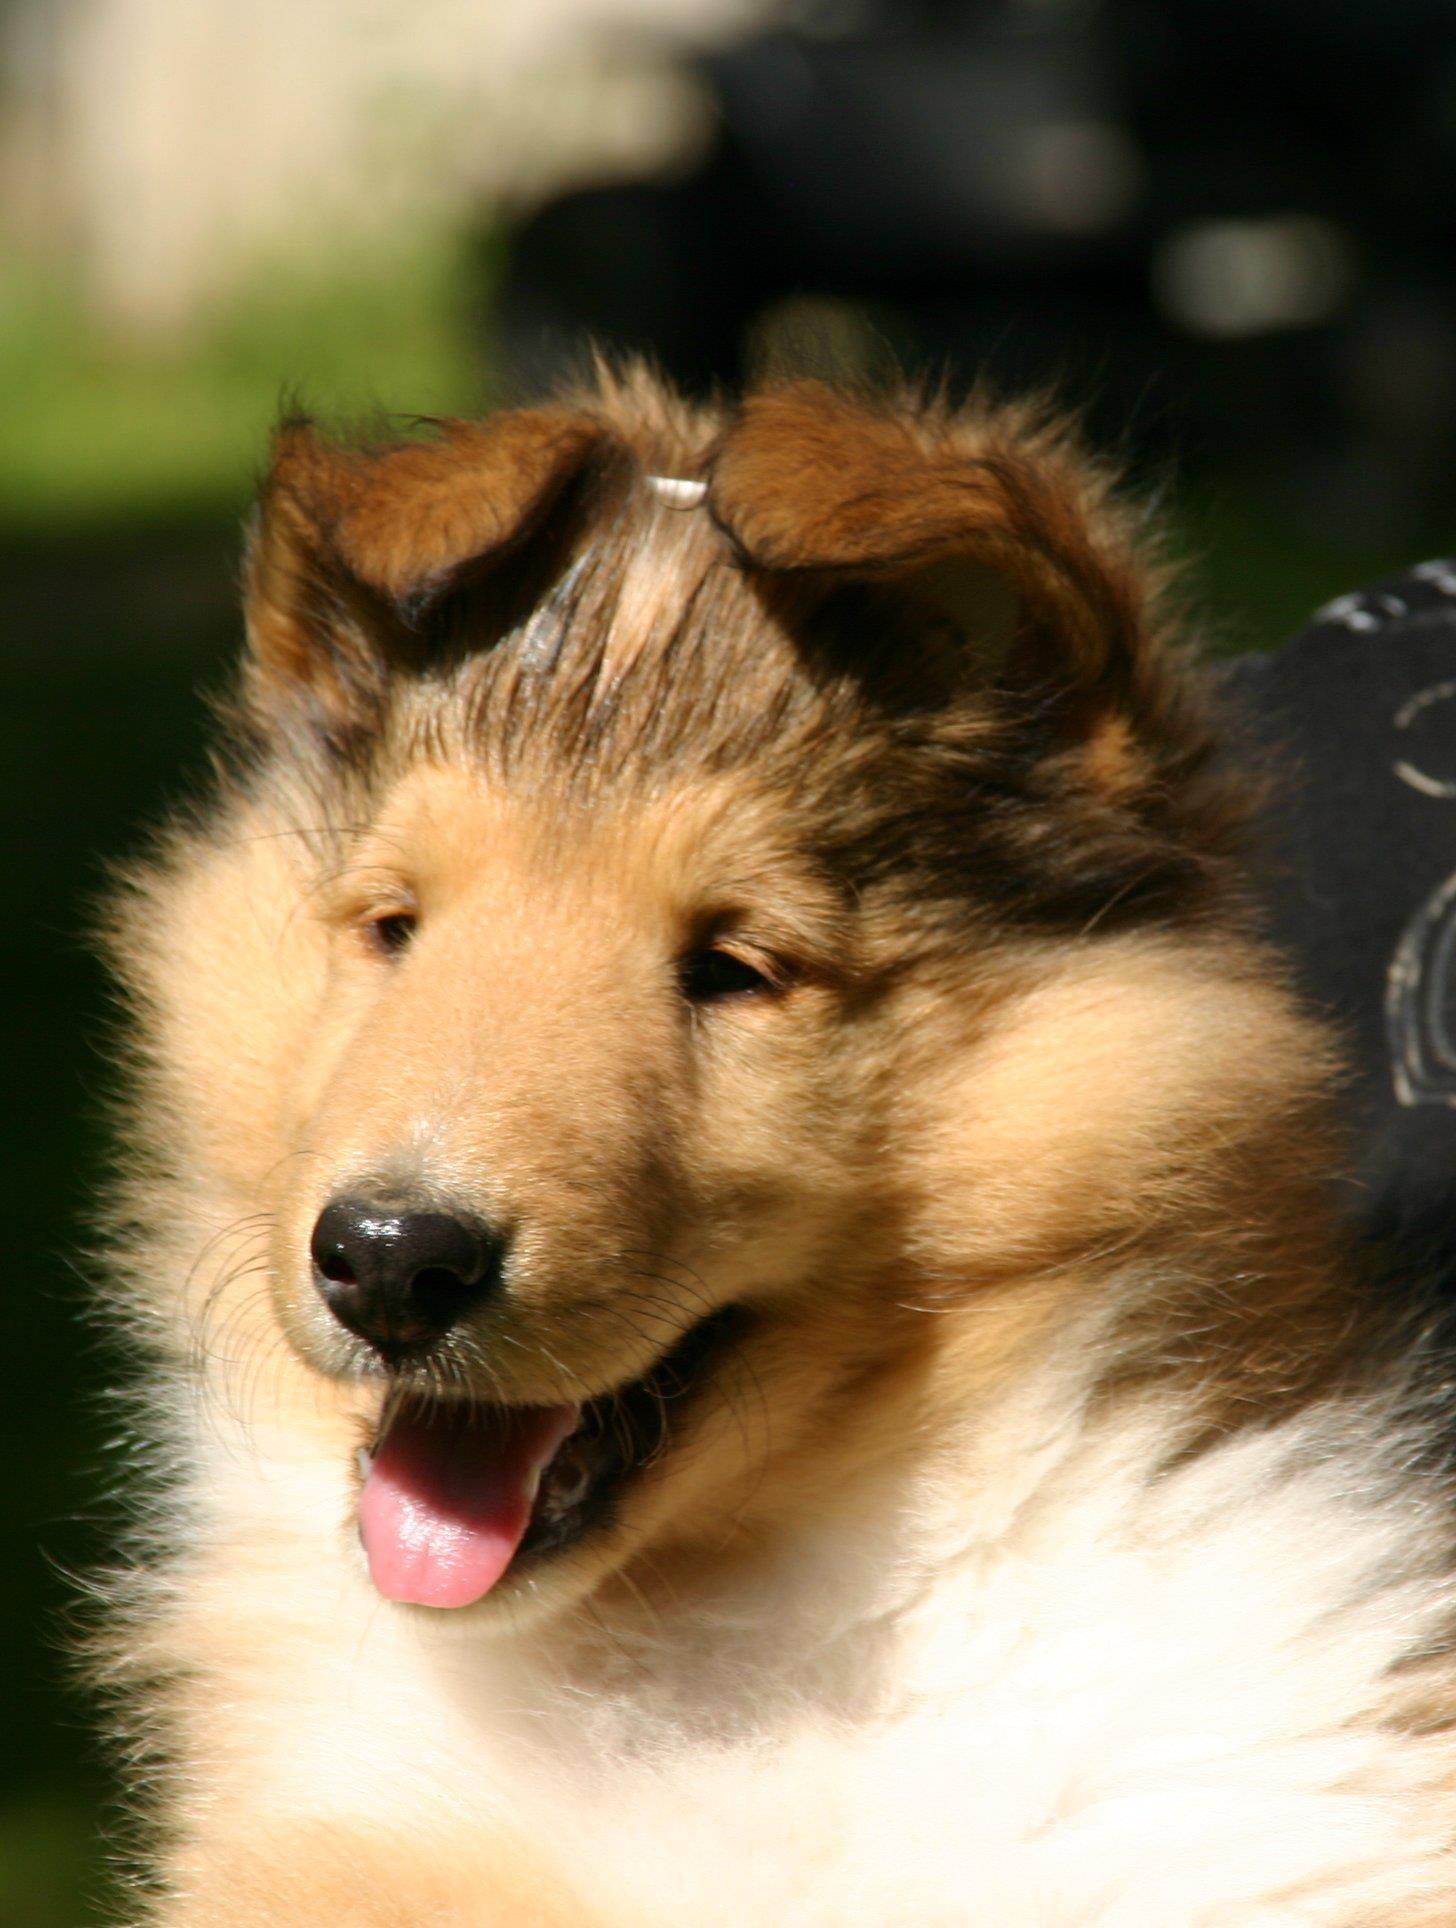 Ennismoor Collie Puppy! Sable and white Rough collie